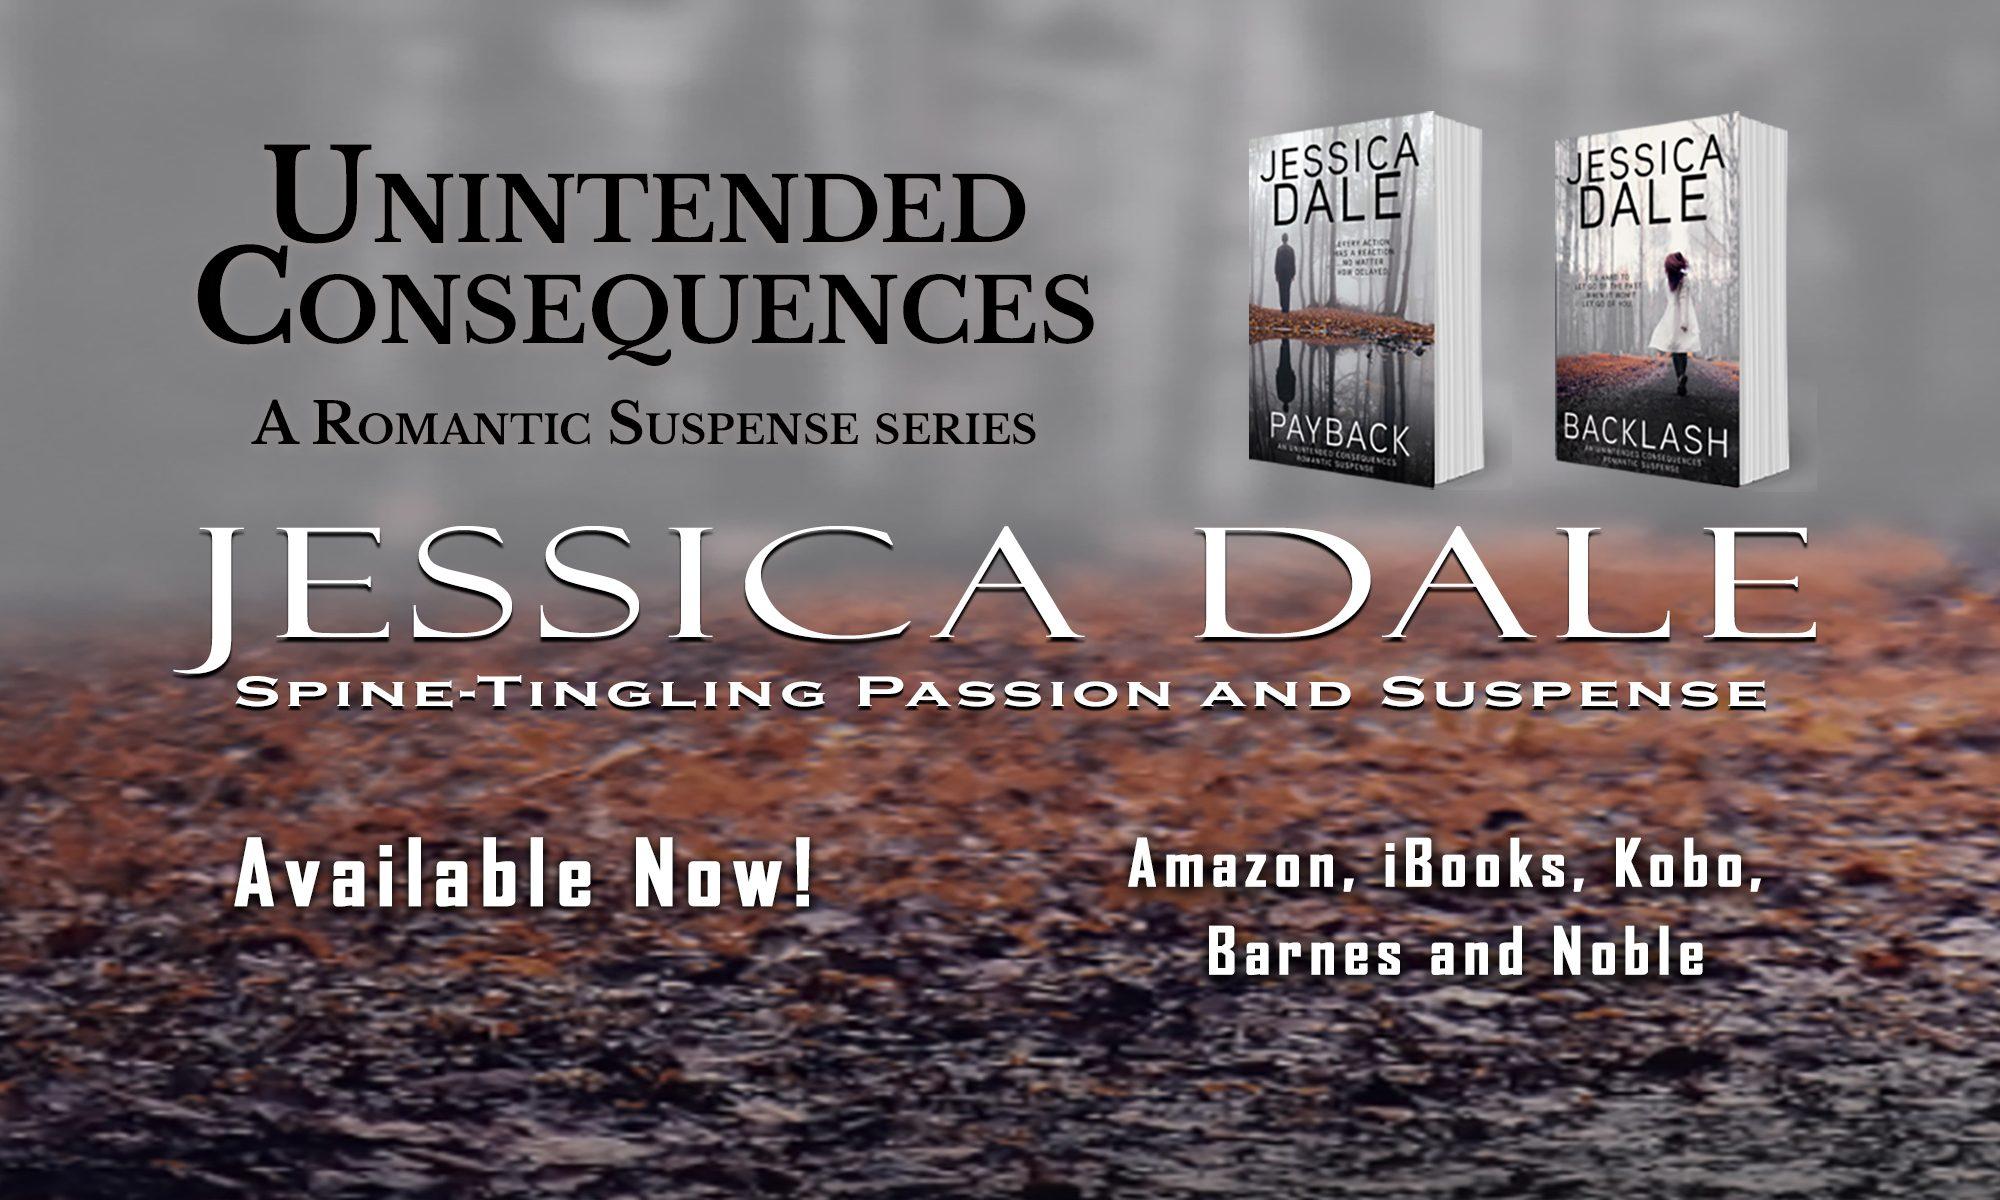 Jessica Dale